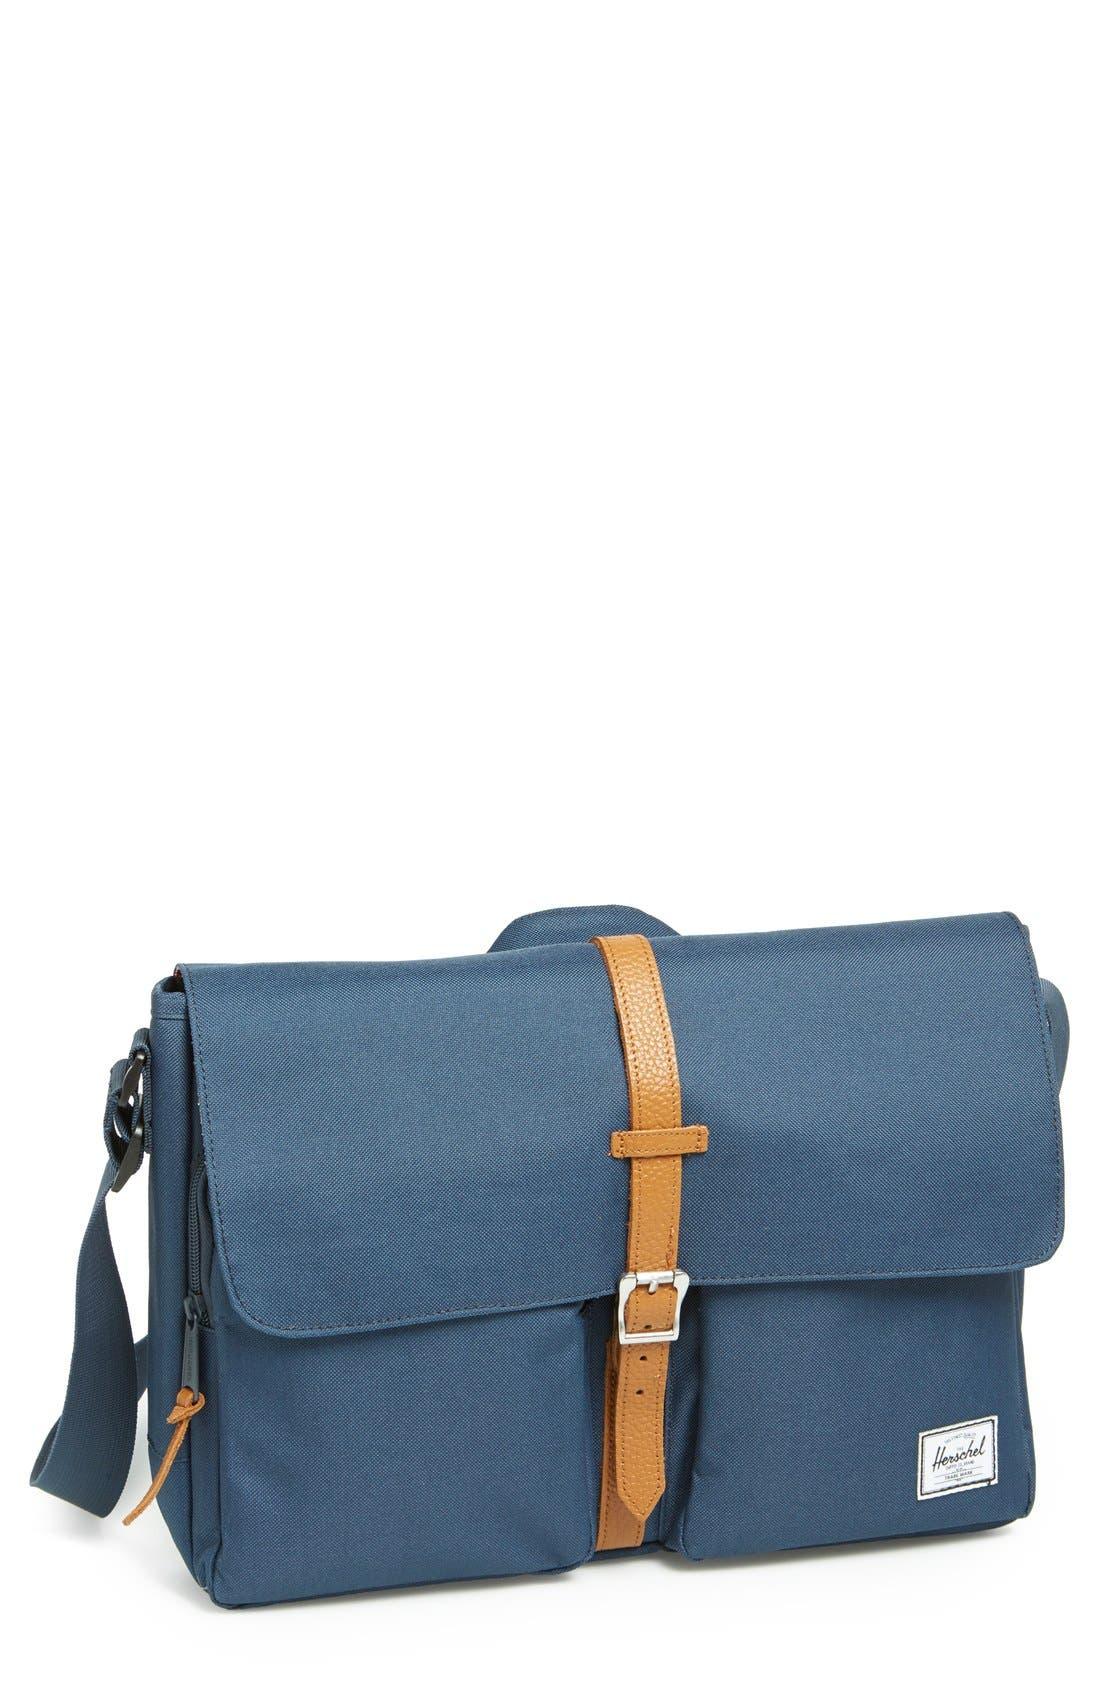 Alternate Image 1 Selected - Herschel Supply Co. 'Columbia' Messenger Bag